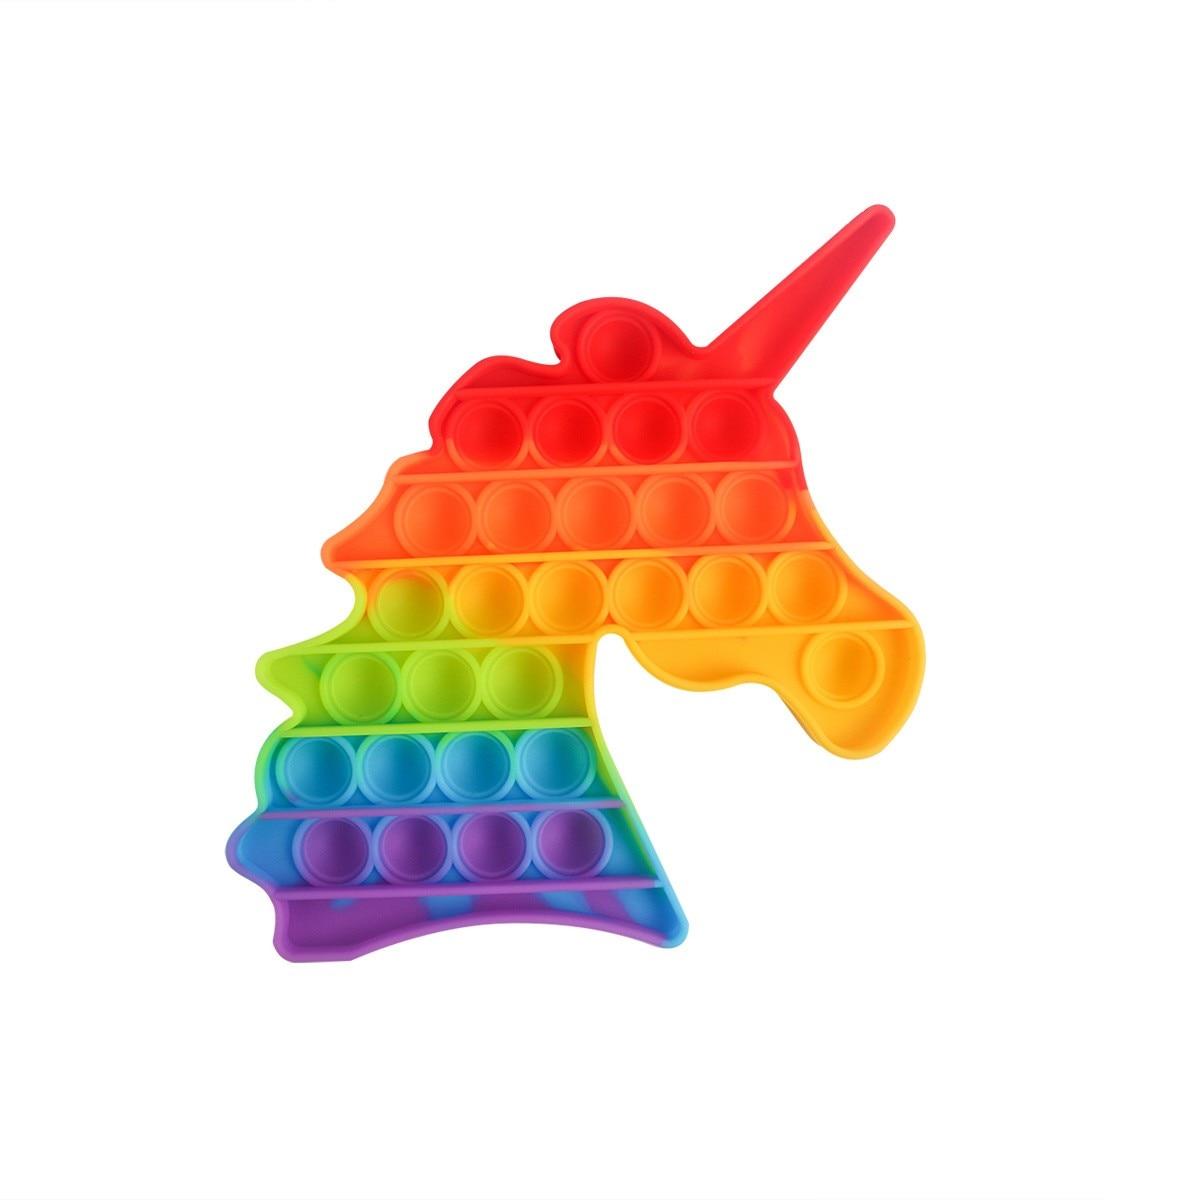 Sensory Toy Stress-Toy Reliver Pops Fidget Rainbow-Push Children Adult It img3